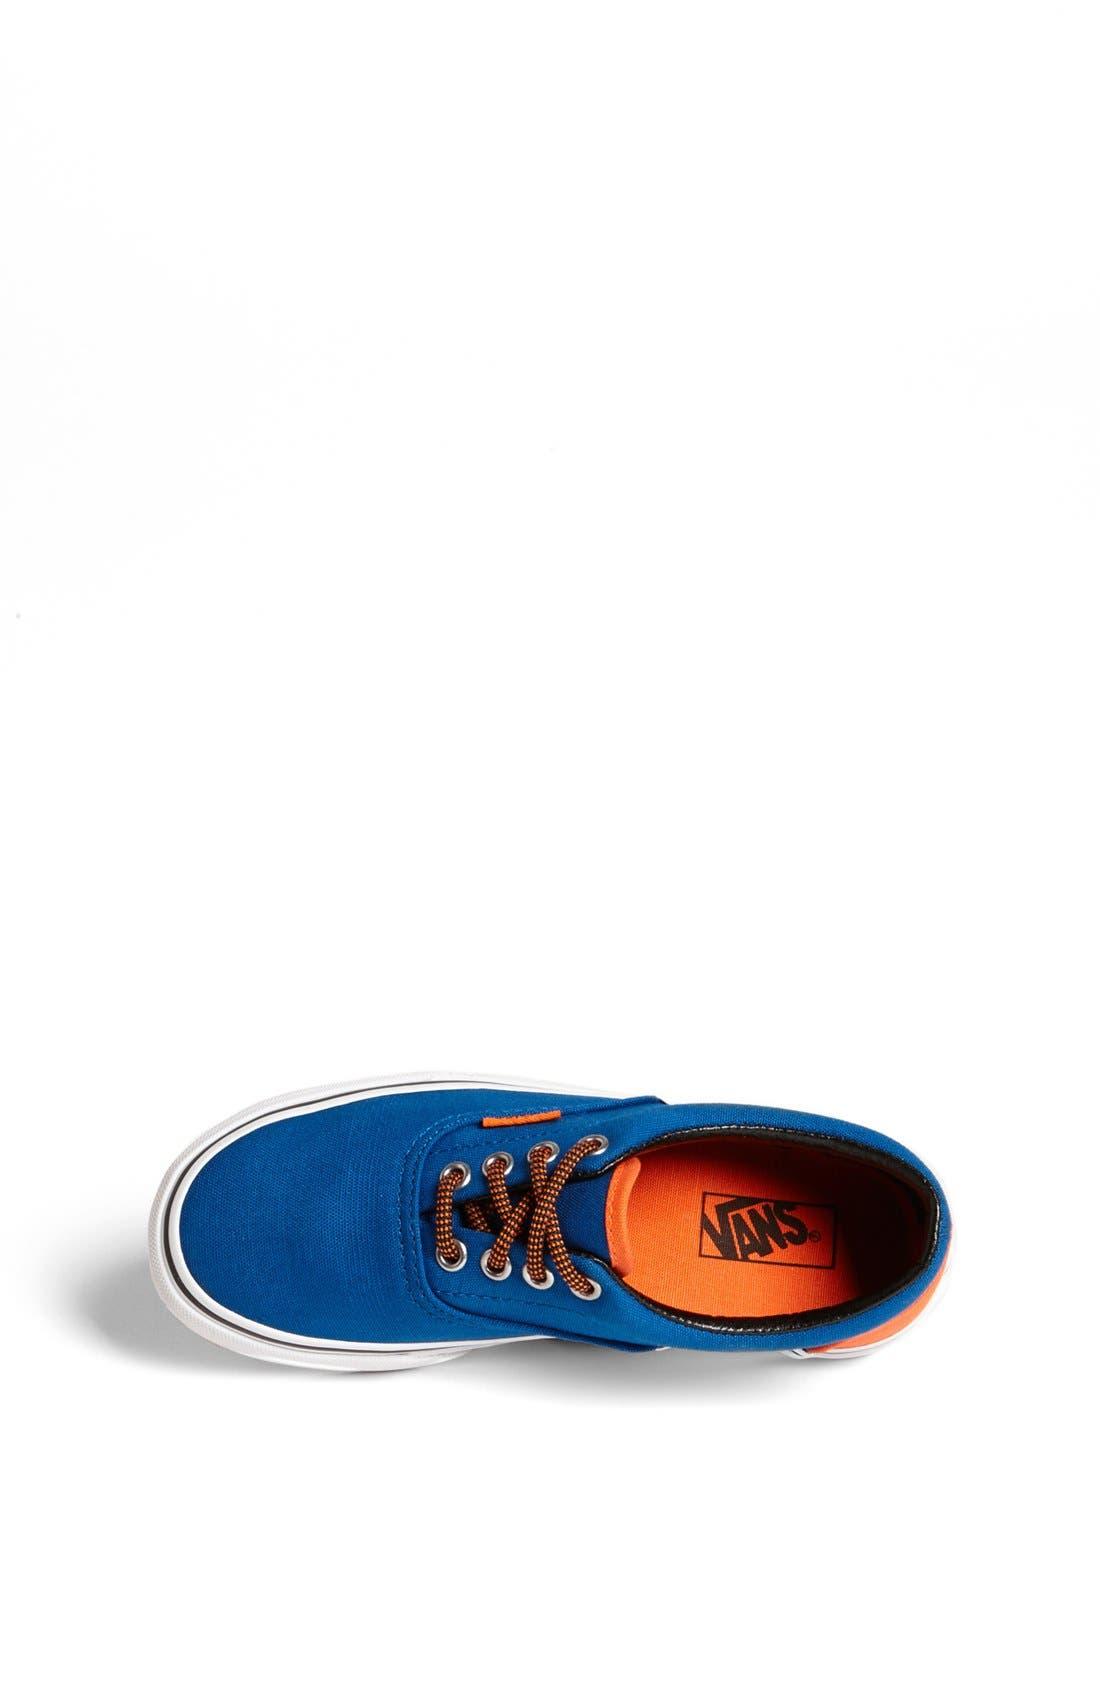 Alternate Image 3  - Vans 'Era - Heel Pop' Sneaker (Toddler, Little Kid & Big Kid)